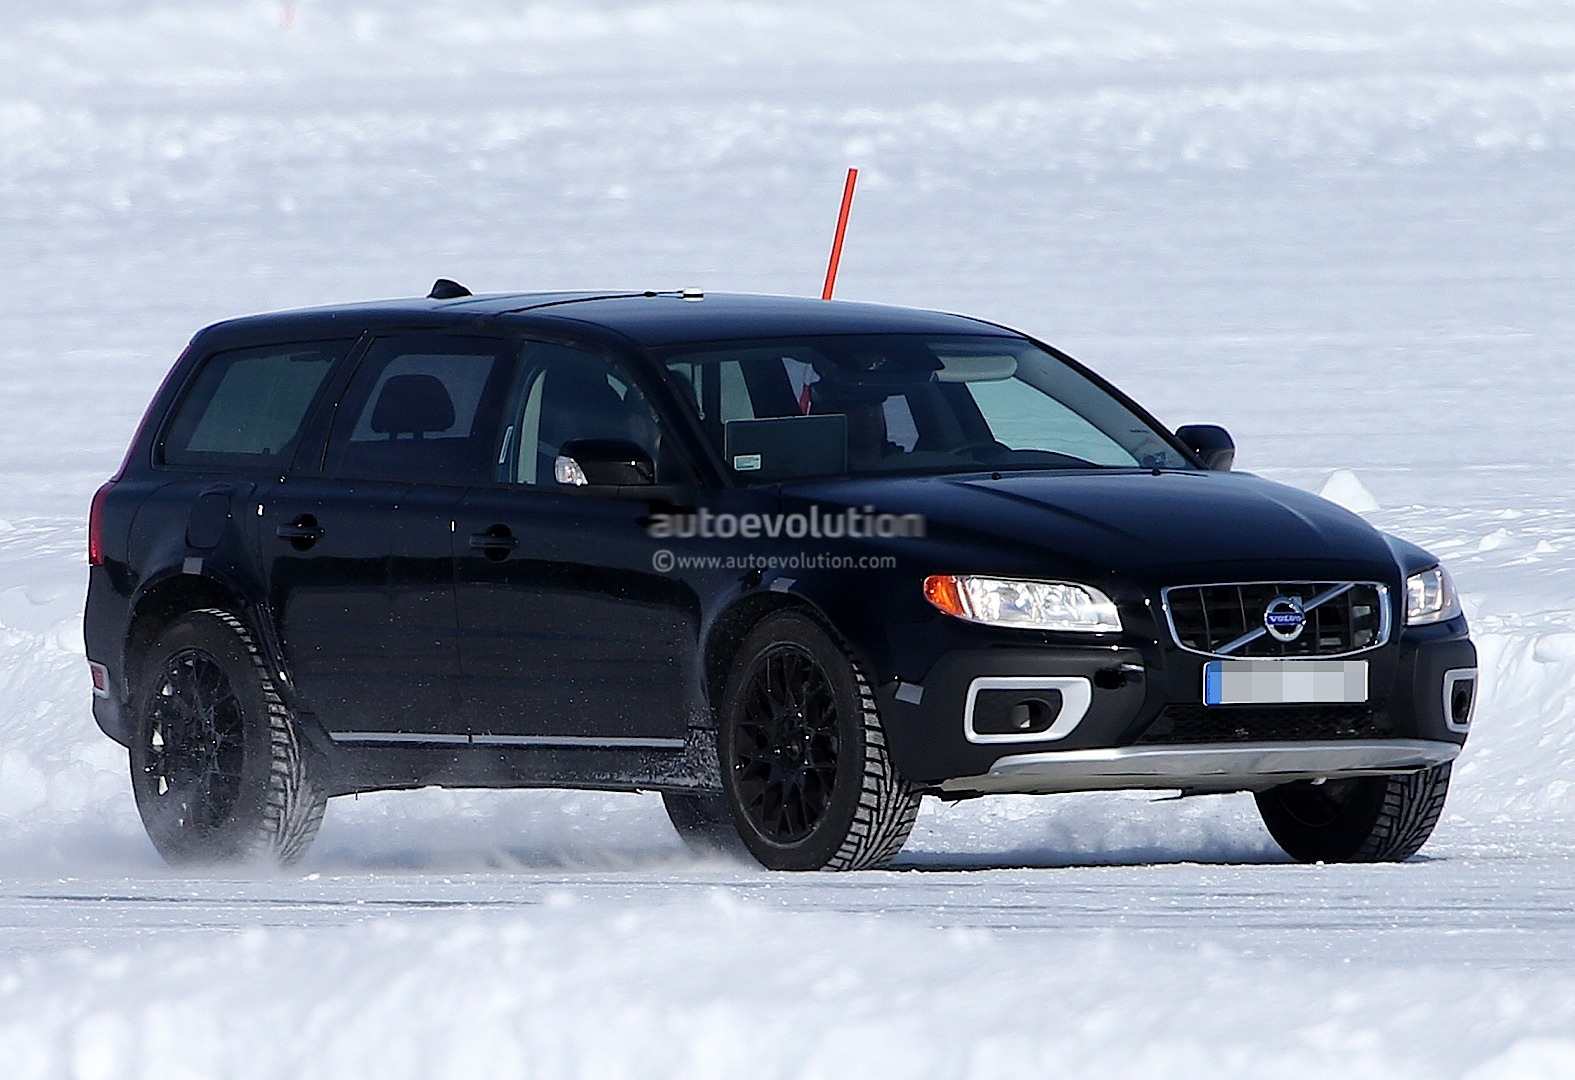 Next-Generation Volvo XC90 Coming in 2014 - autoevolution